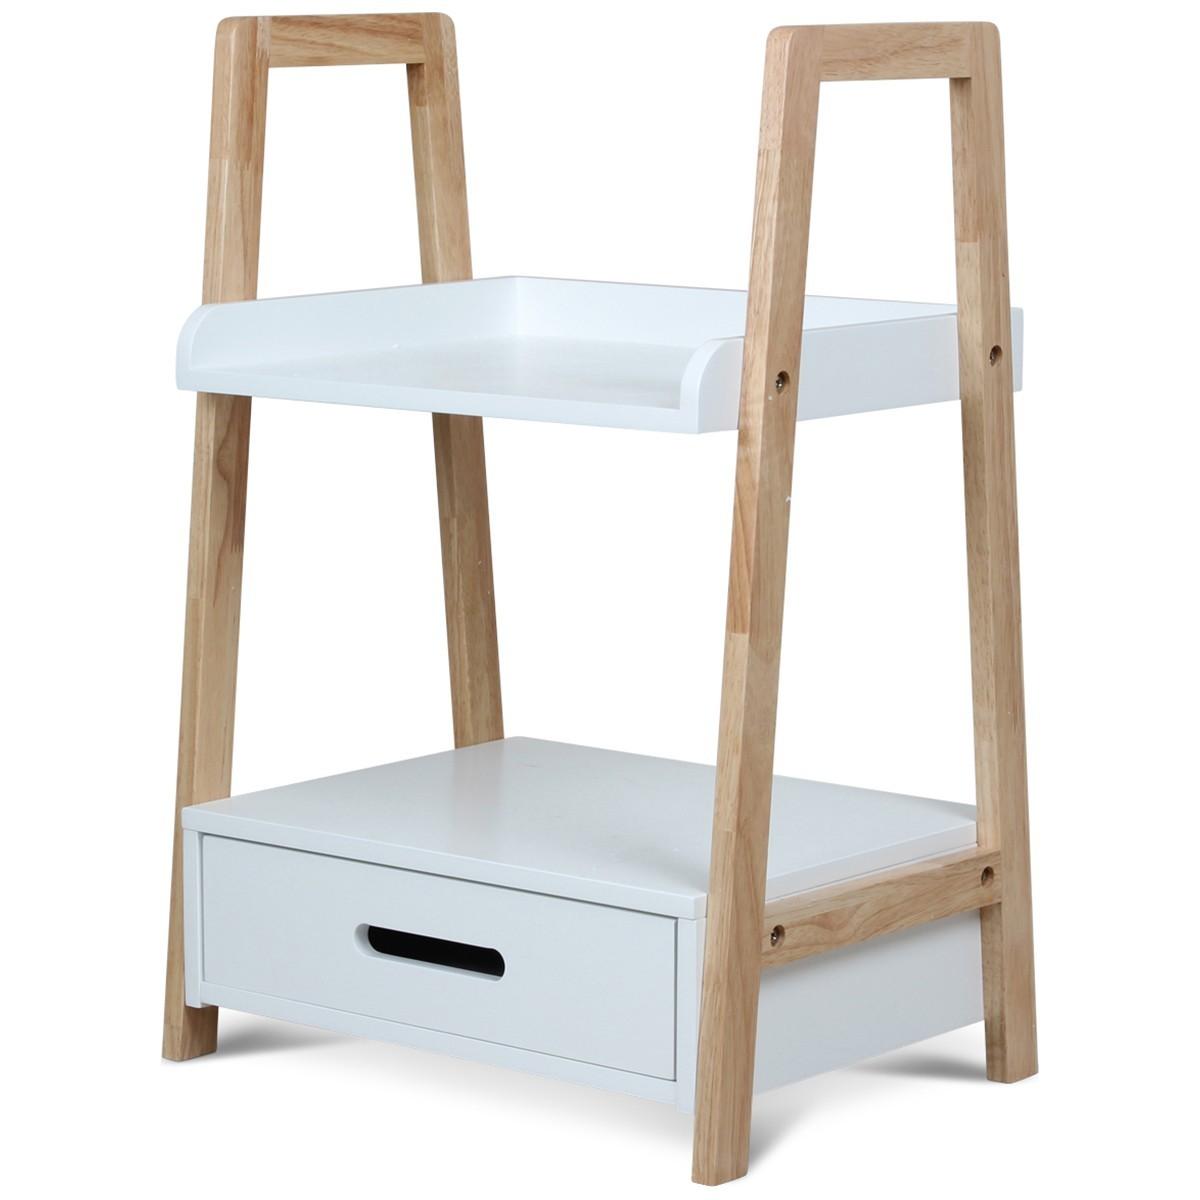 chevet naturel et blanc 1 tiroir 1 tablette oxork. Black Bedroom Furniture Sets. Home Design Ideas